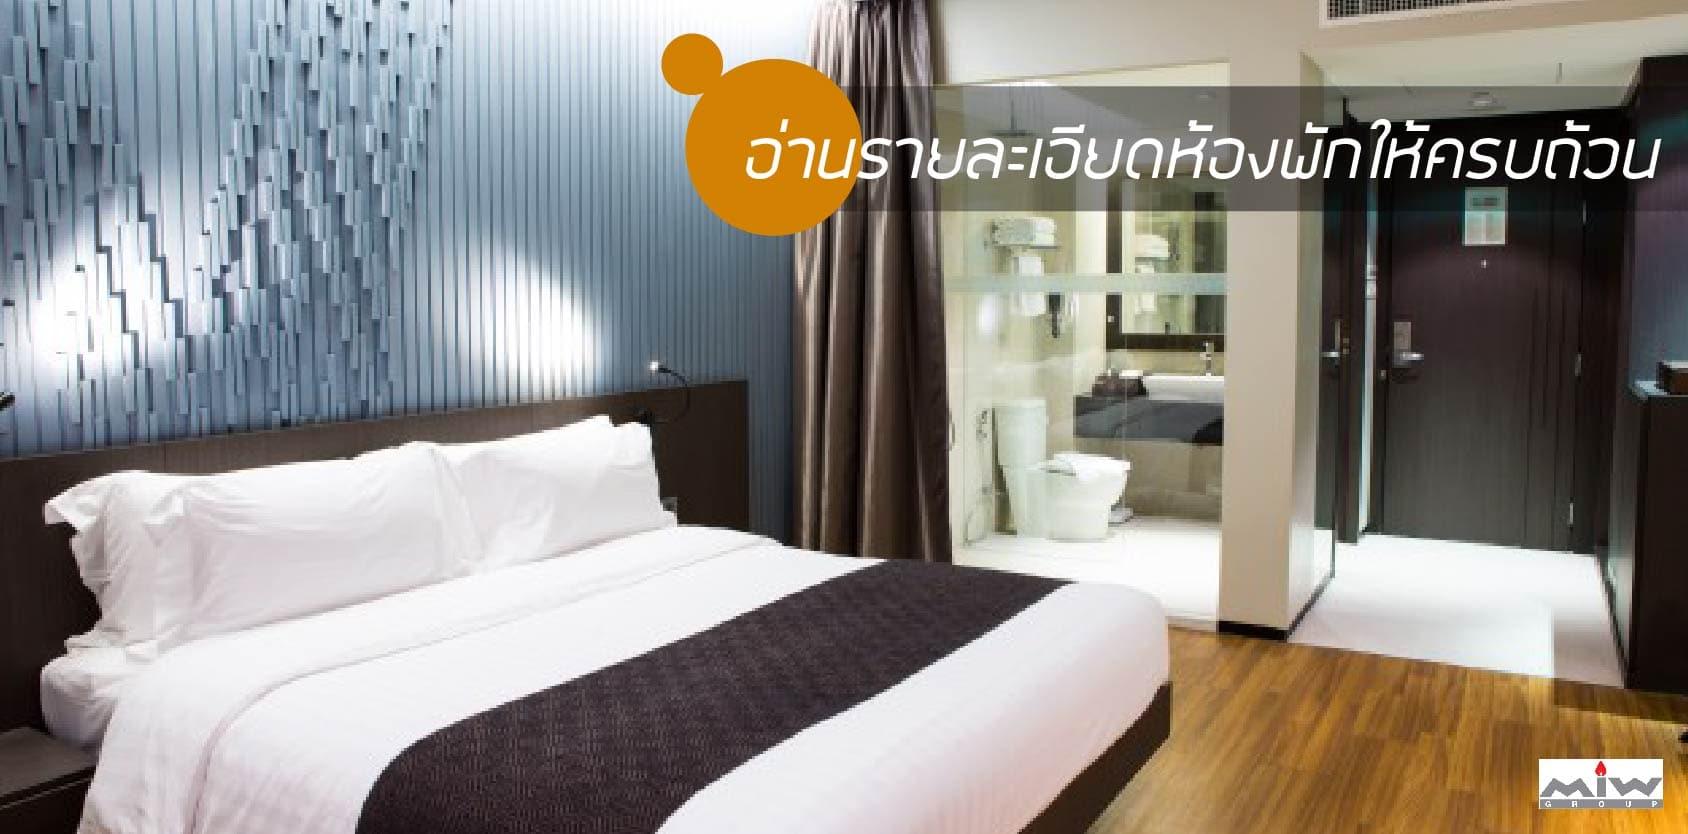 How to choose your accommodation 02 1 - แนะนำวิธีเลือกที่พัก เลือกอย่างไรให้ถูกใจ เที่ยวสนุก ไม่มีสะดุด